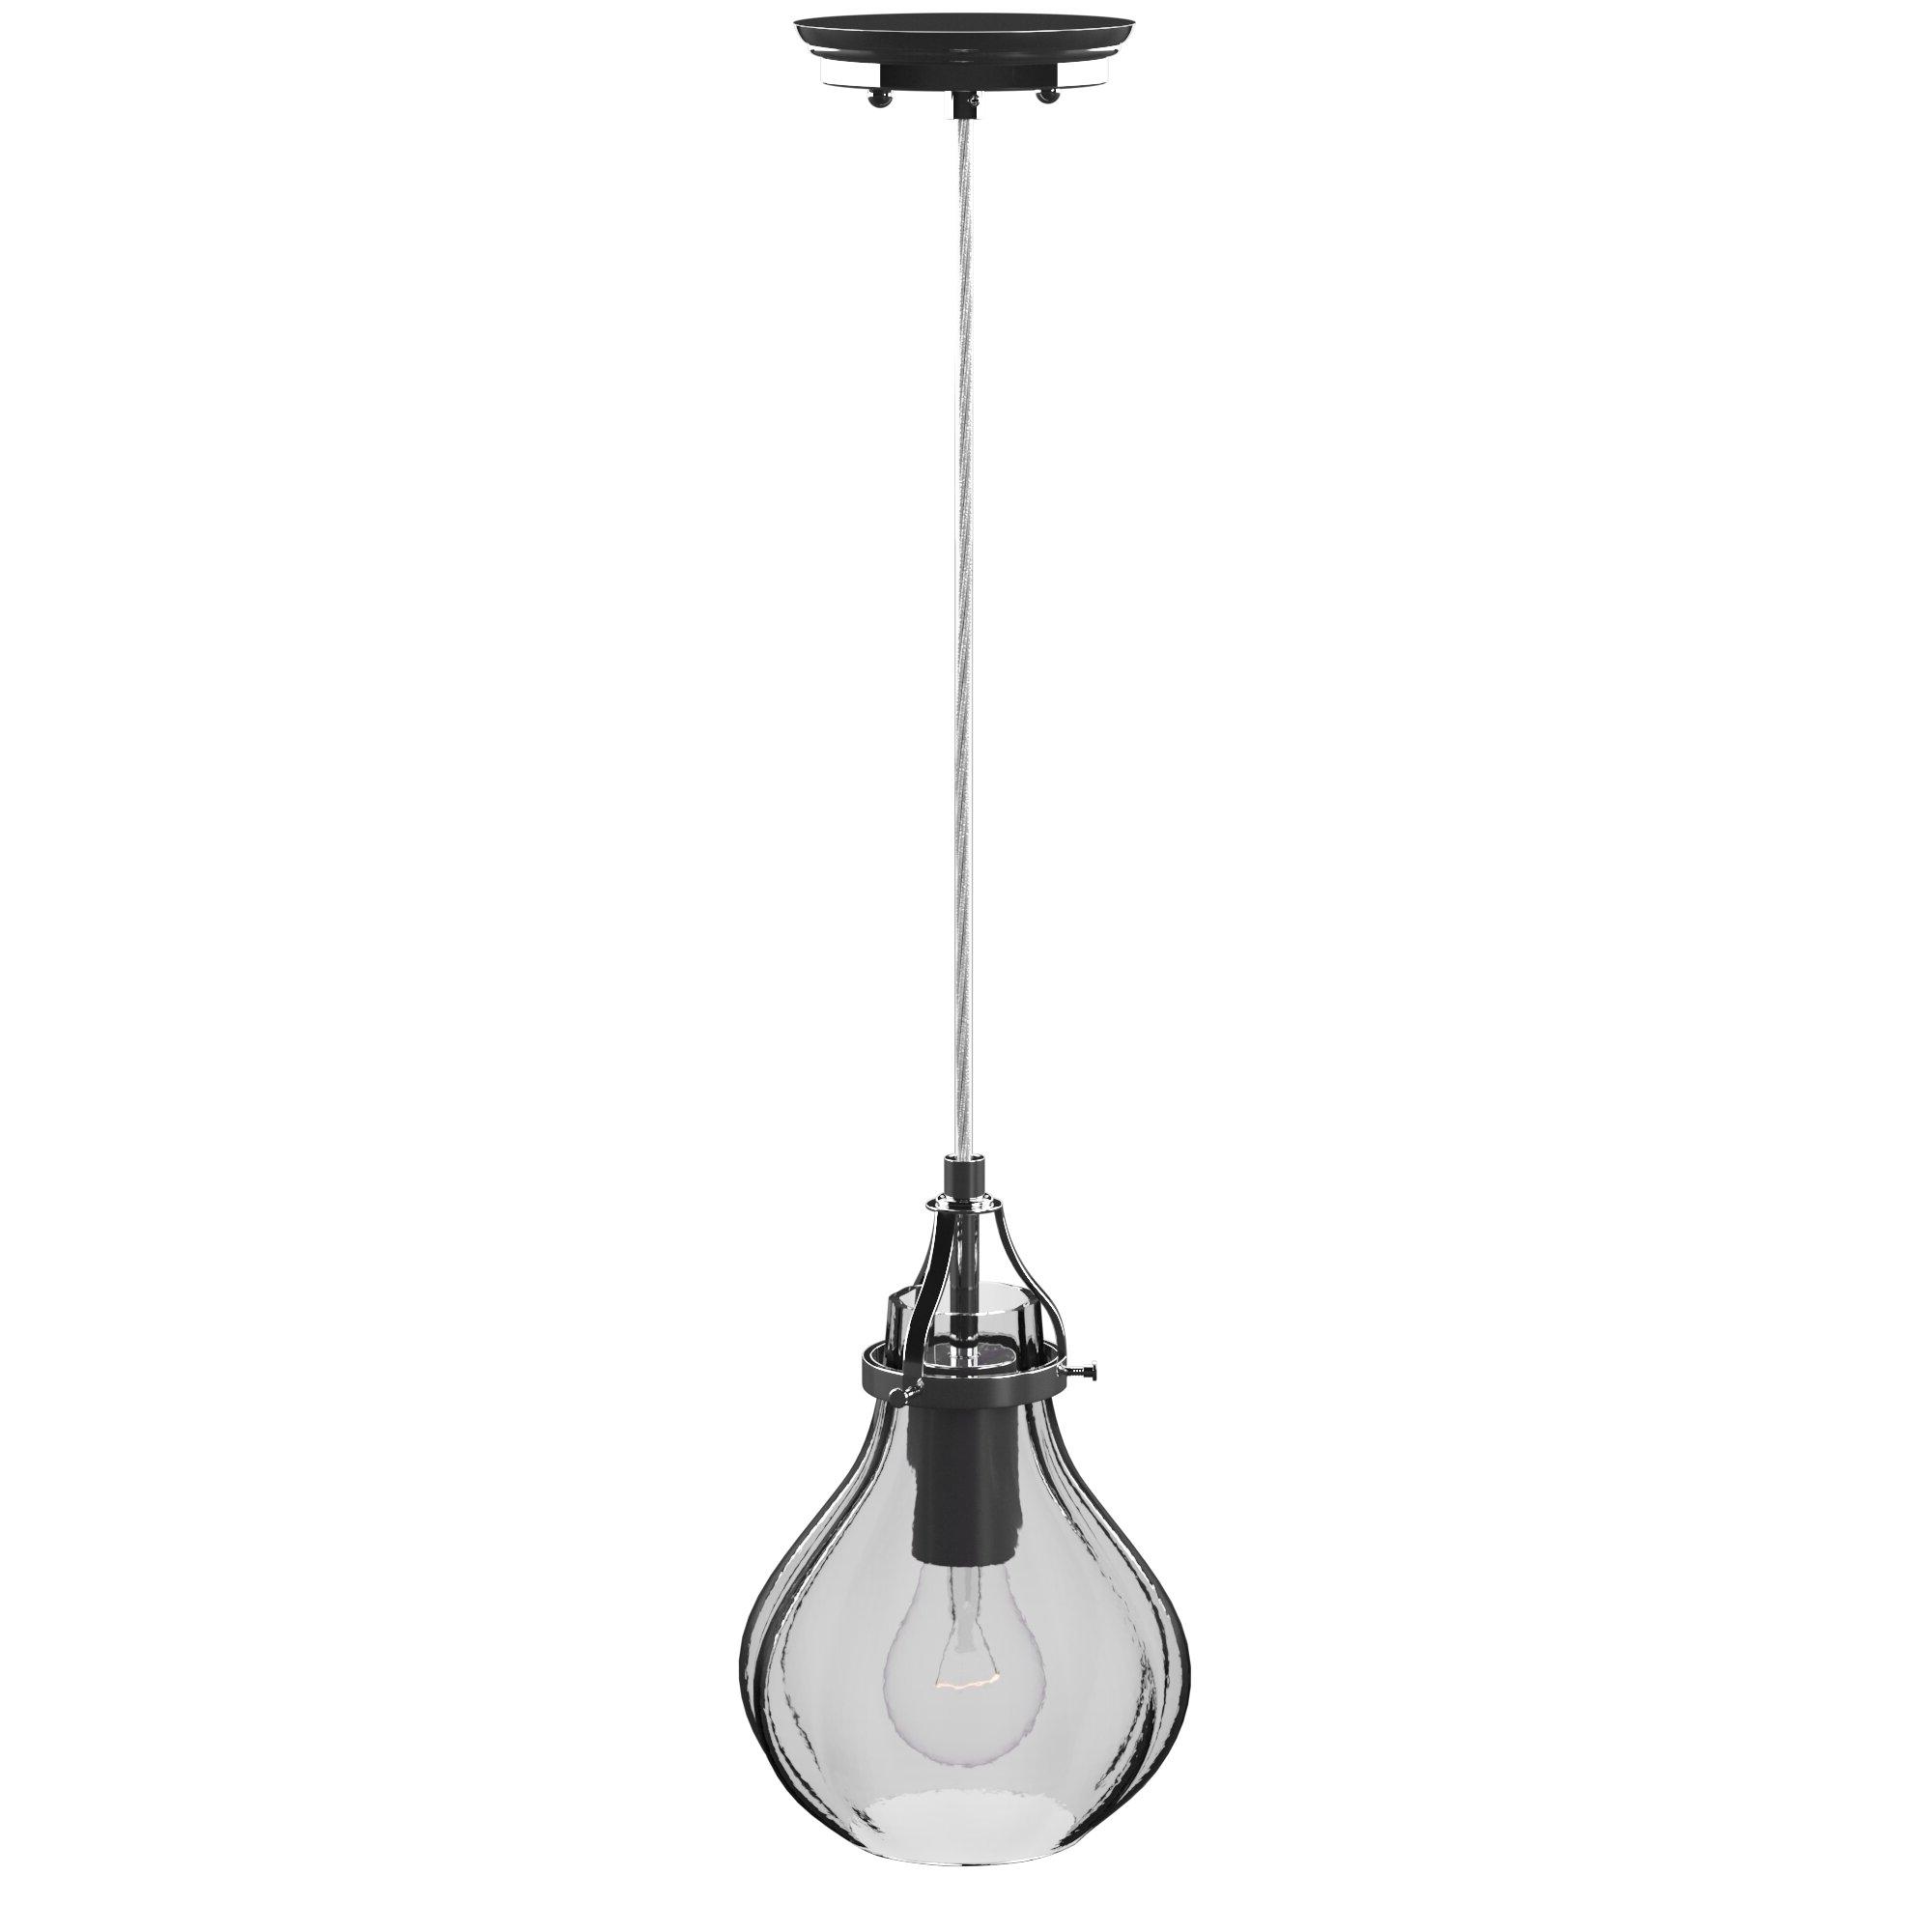 Orofino 1 Light Single Teardrop Pendant For Most Current Poynter 1 Light Single Cylinder Pendants (Gallery 9 of 20)